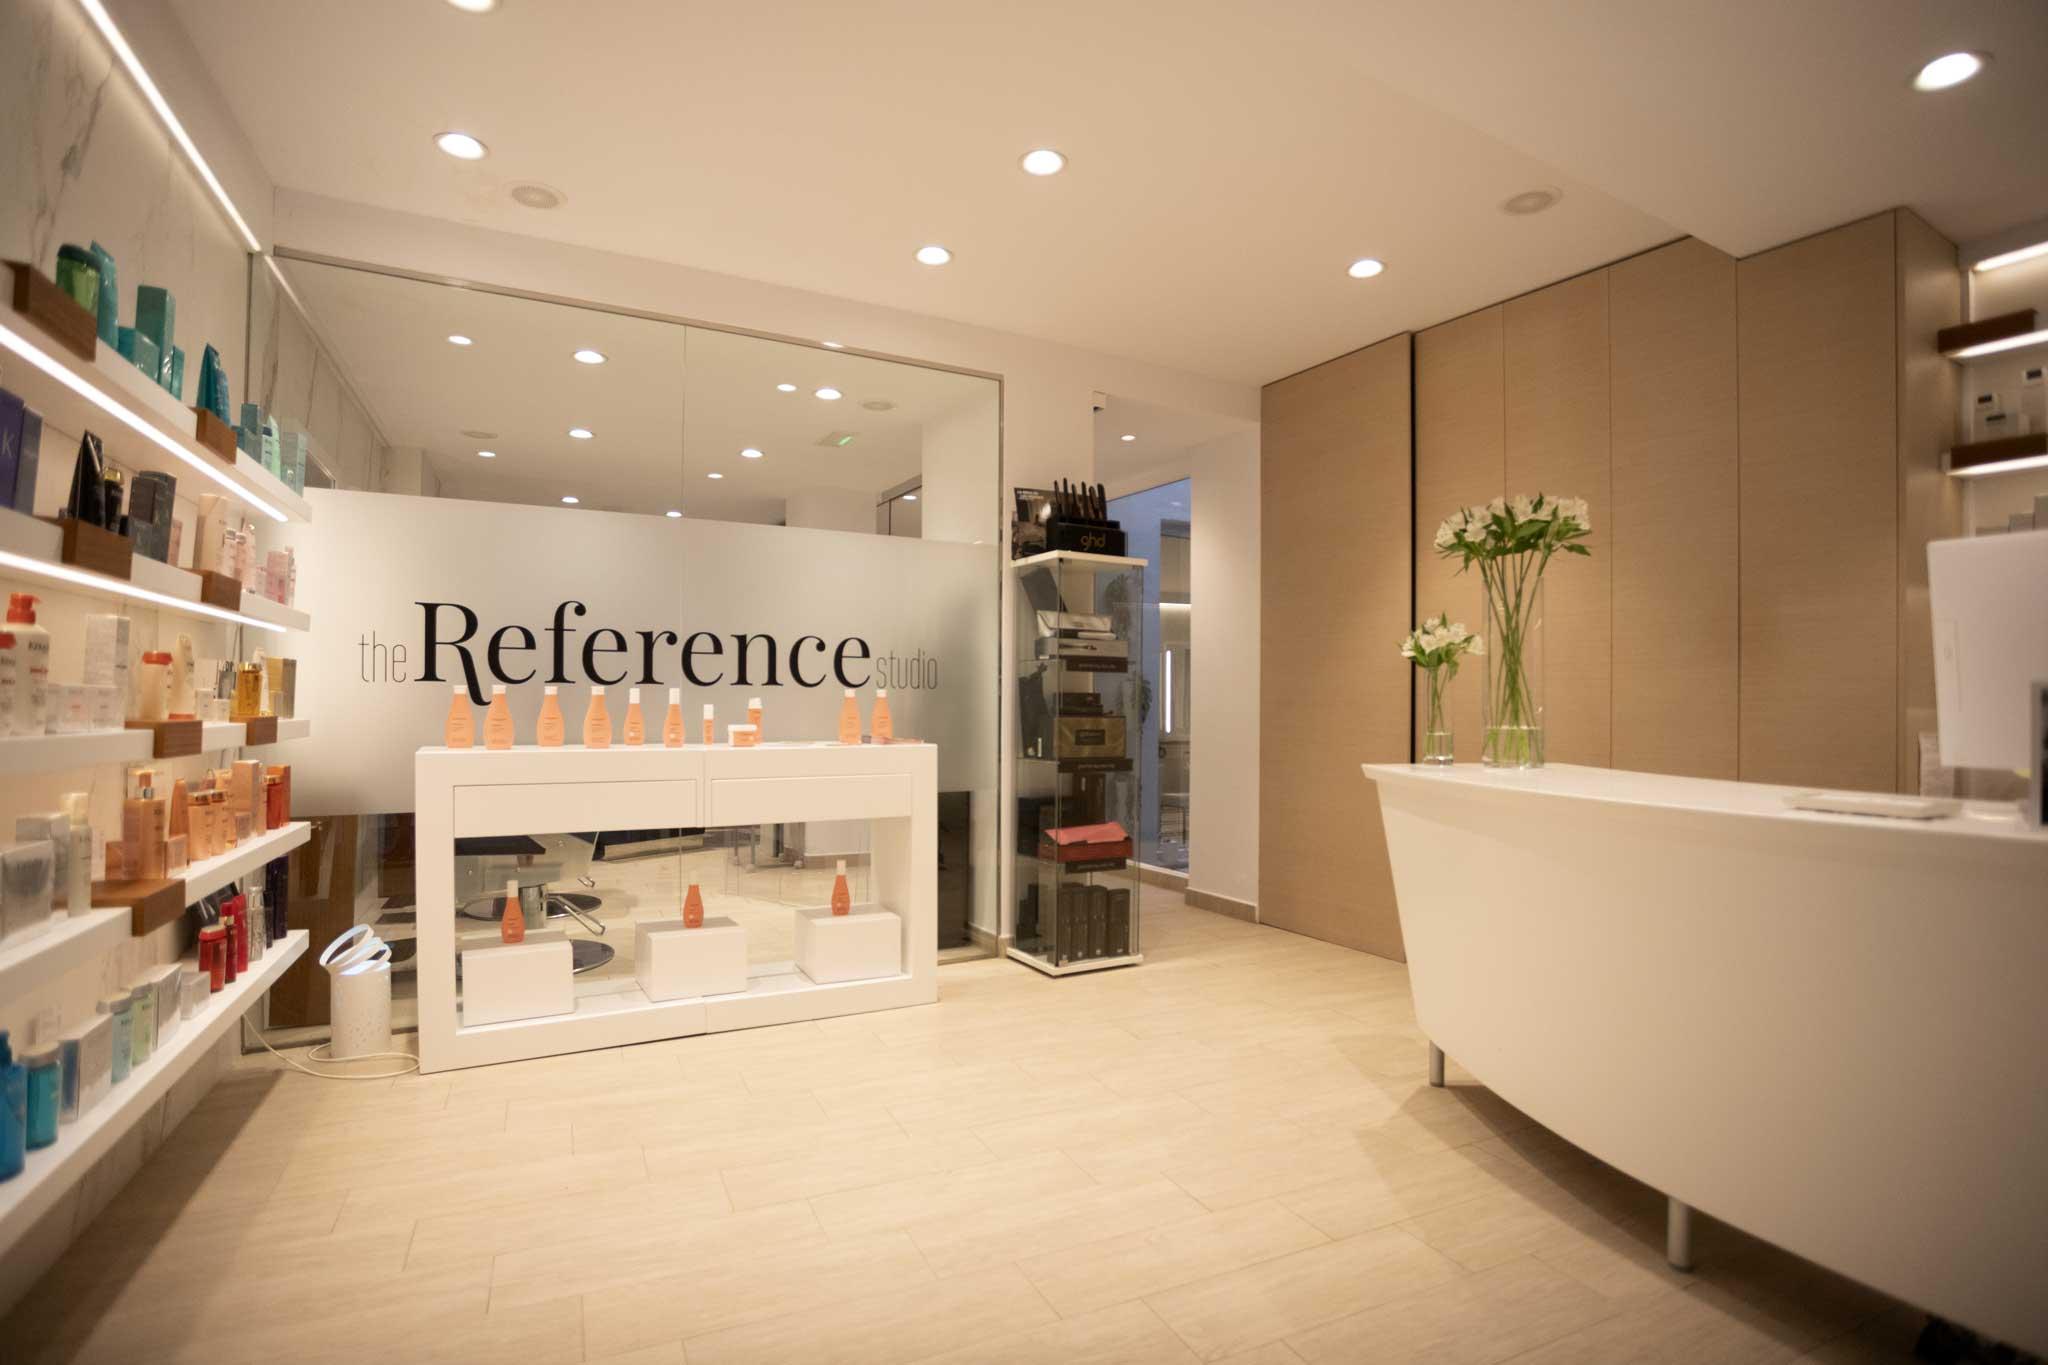 Salon de peluqueria en Denia – The Reference Studio